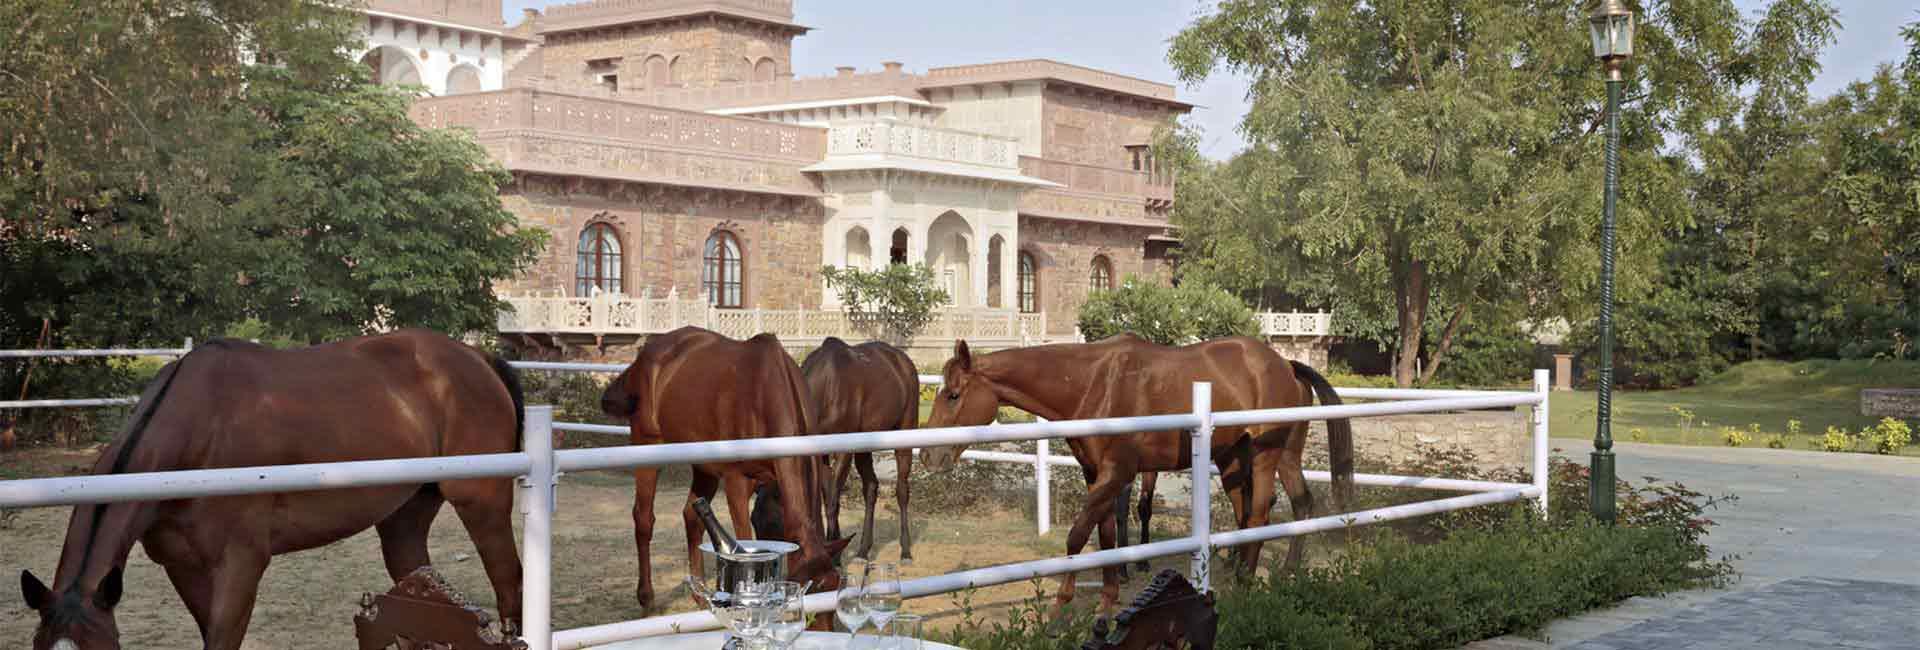 Holiday-Rental-in-Jaipur1